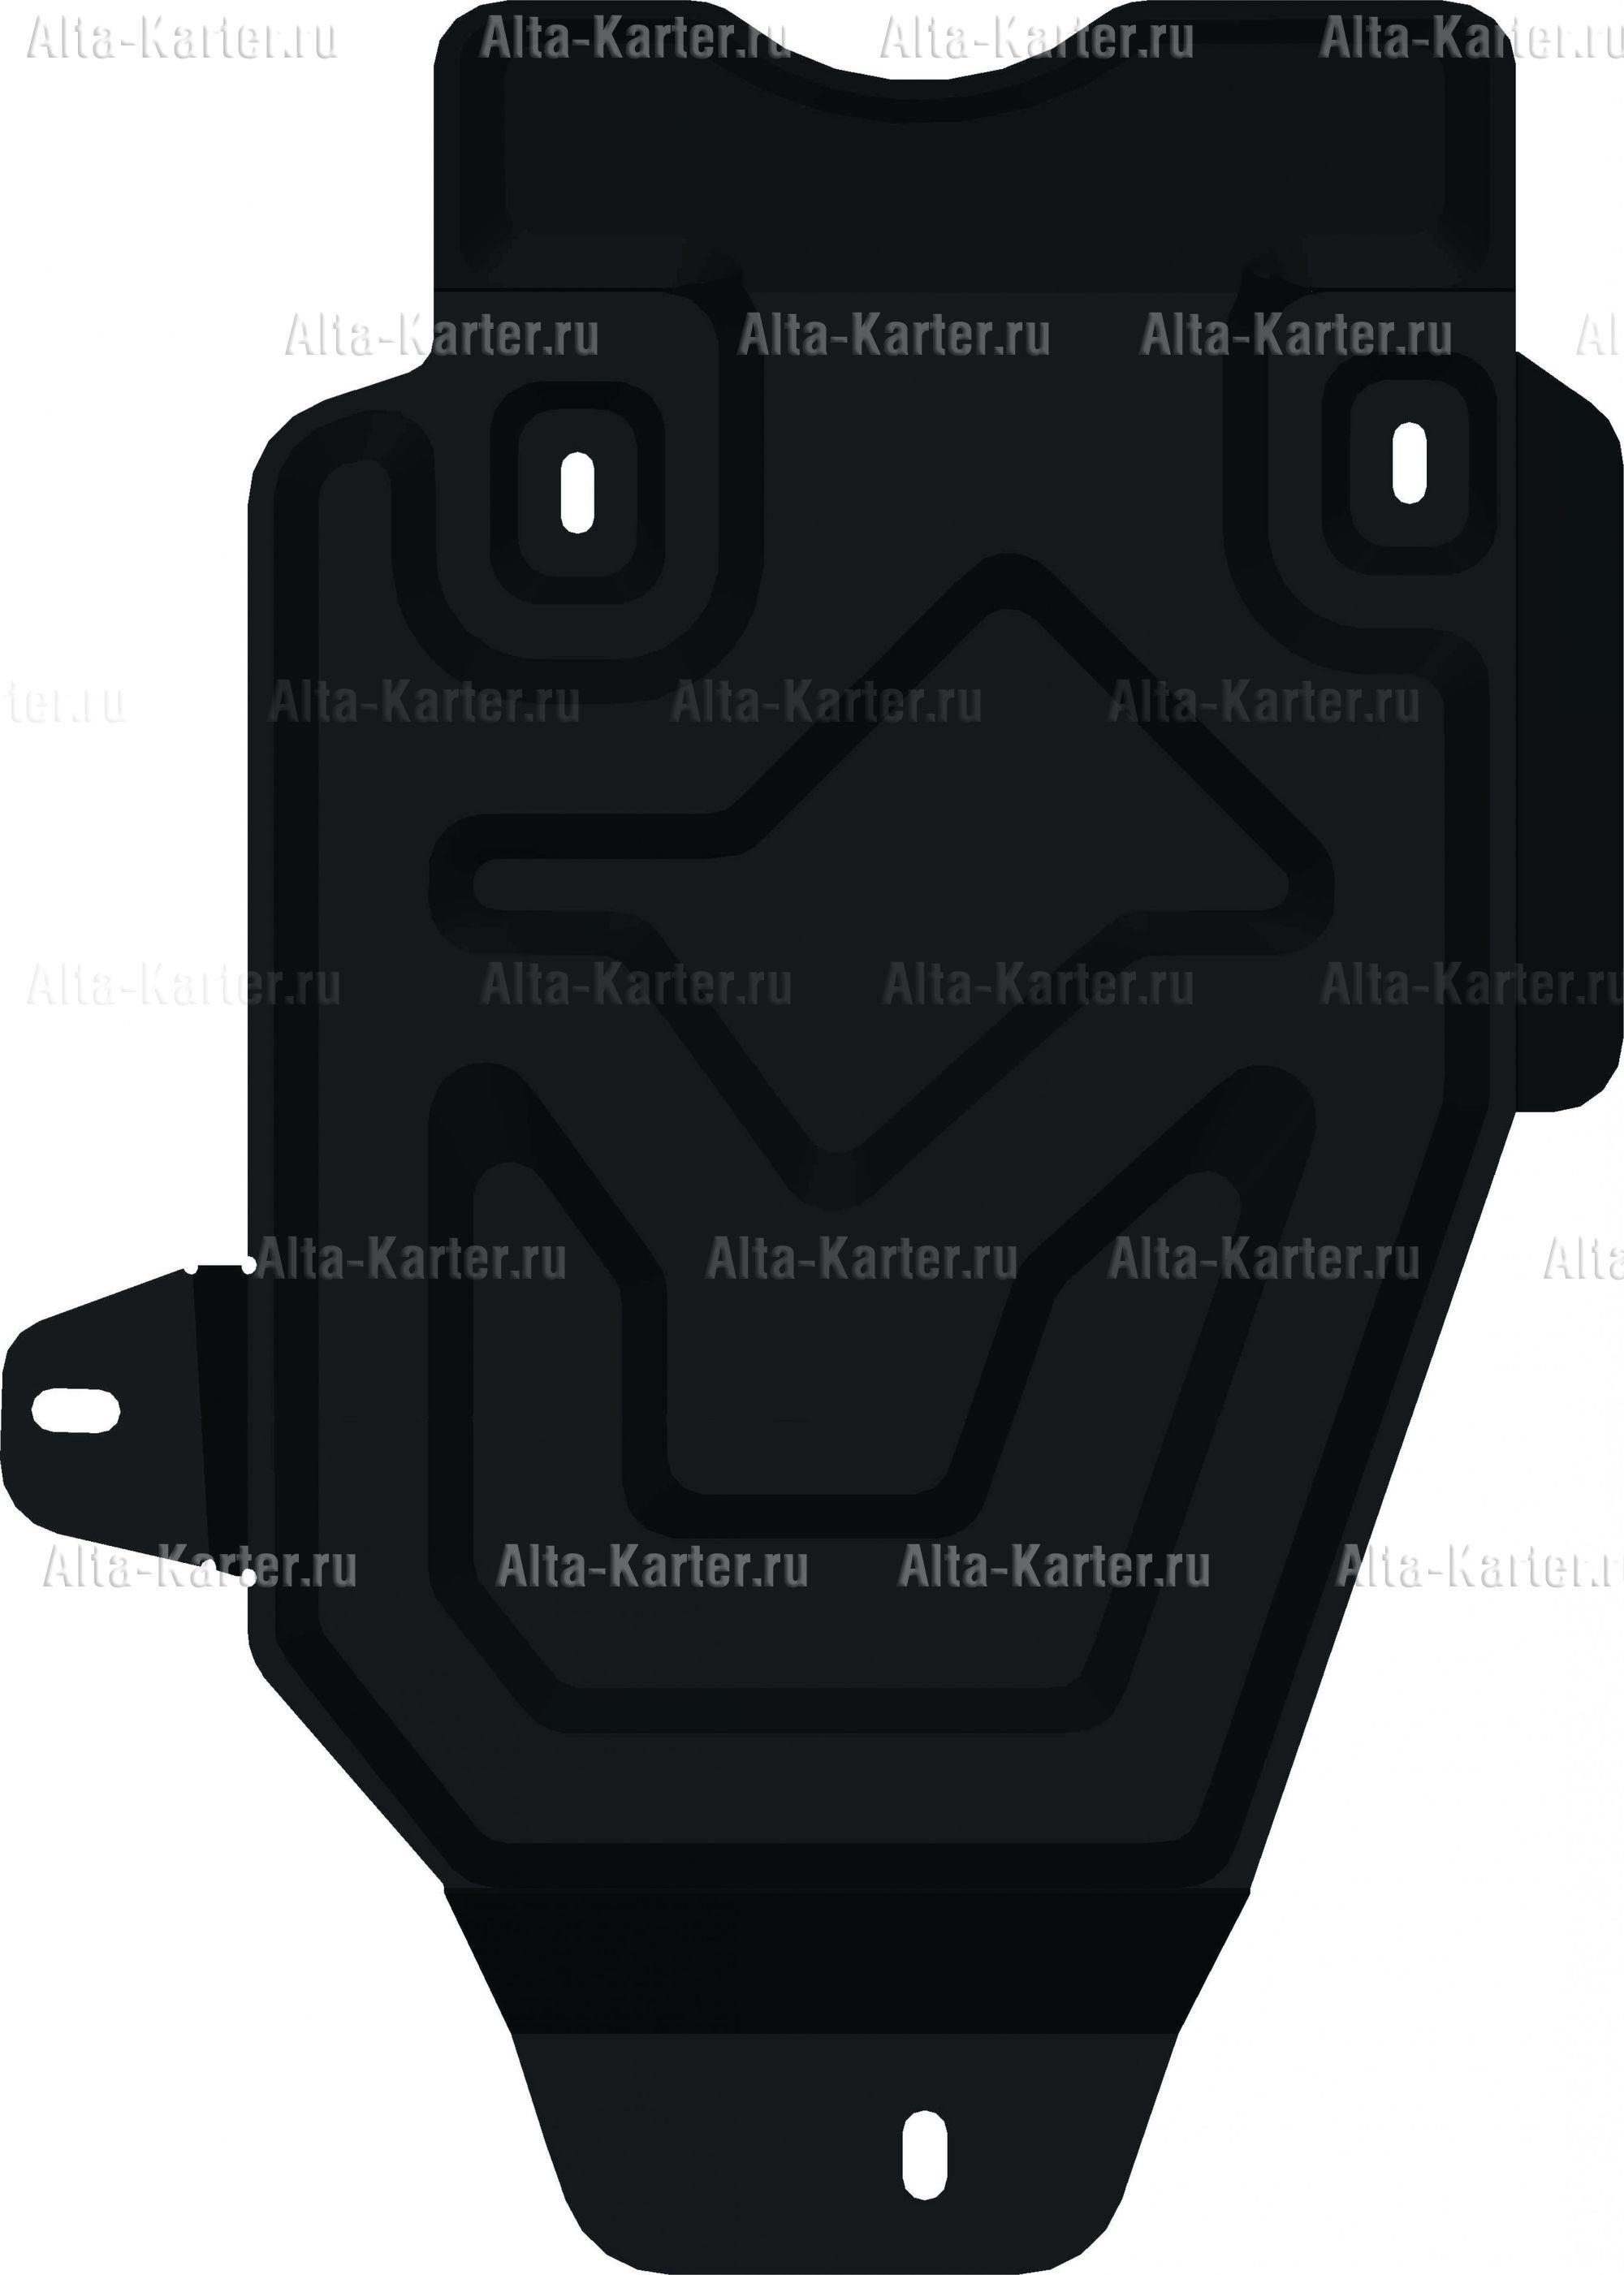 Защита Alfeco для редуктора заднего моста Nissan Terrano 4WD 2014-2021. Артикул ALF.18.04 st